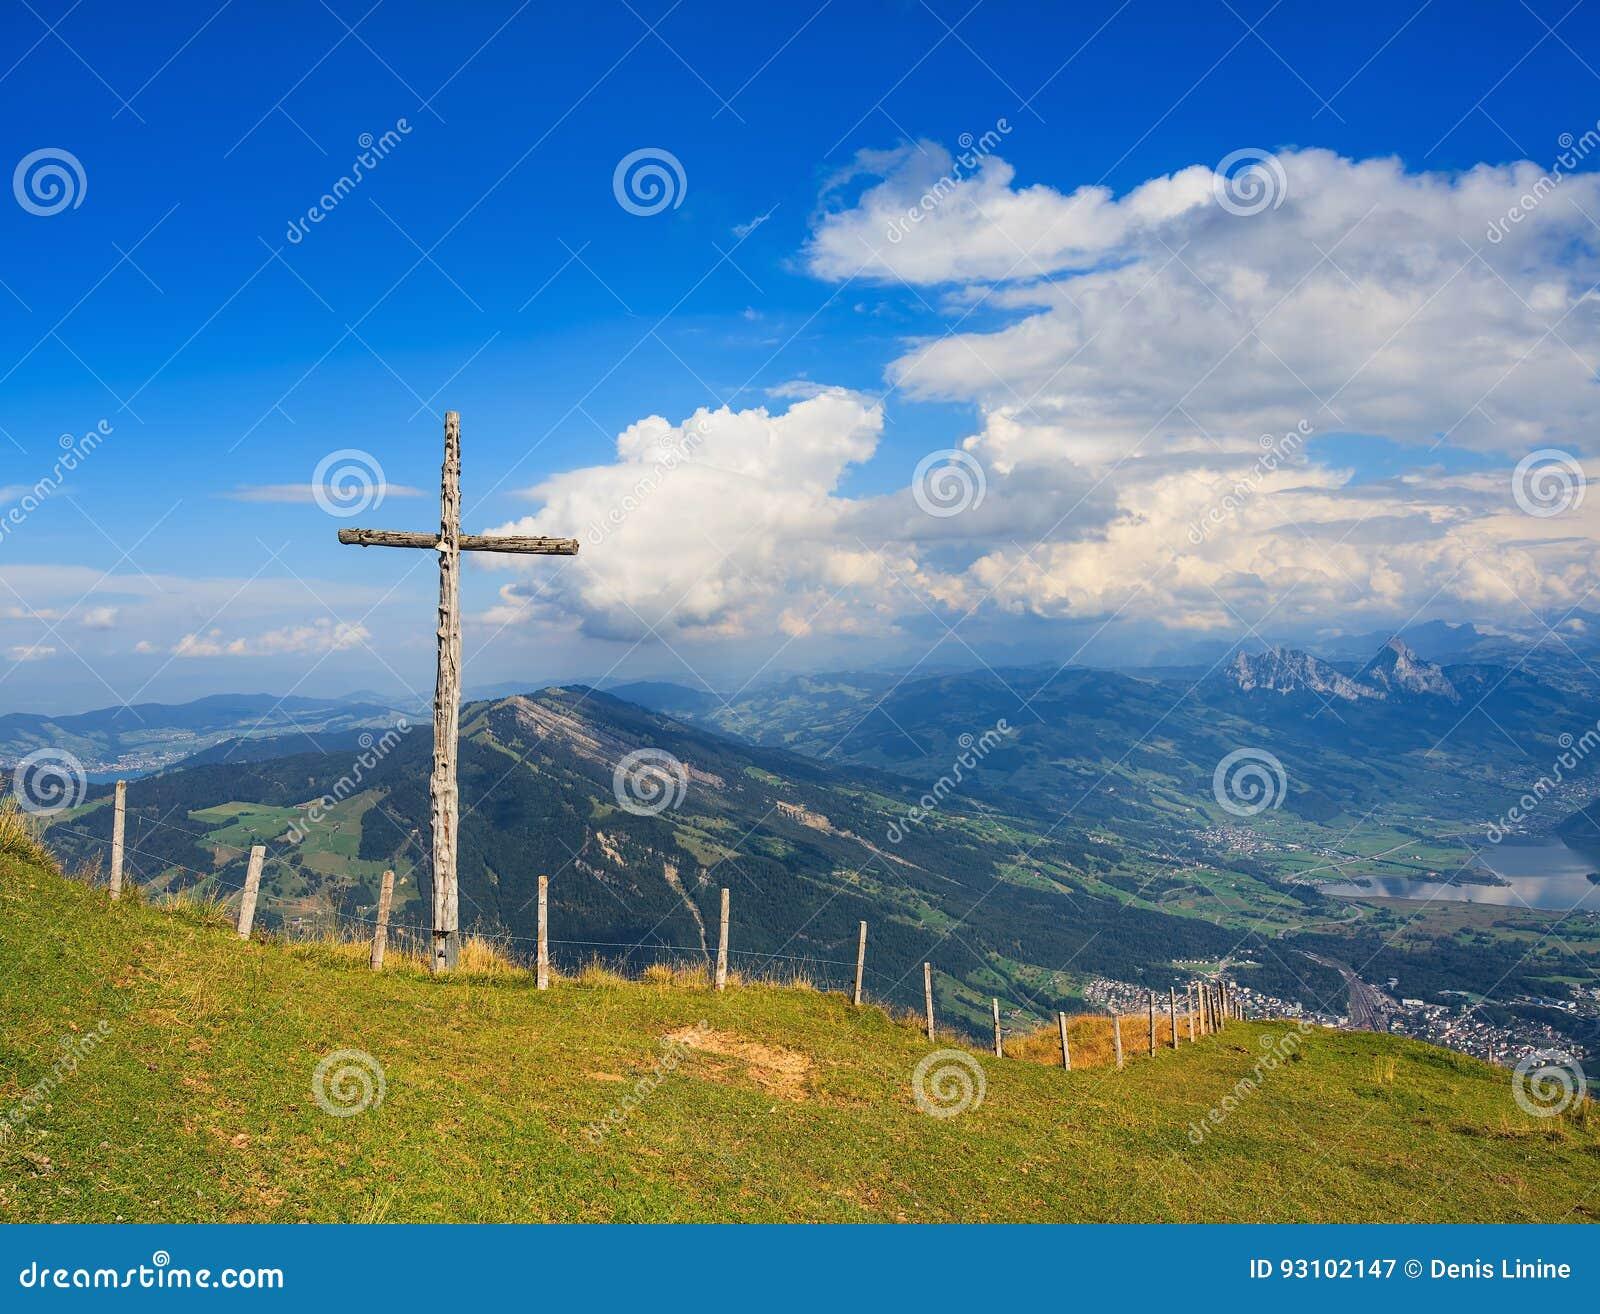 view from mt rigi in switzerland stock image image of slope rigi